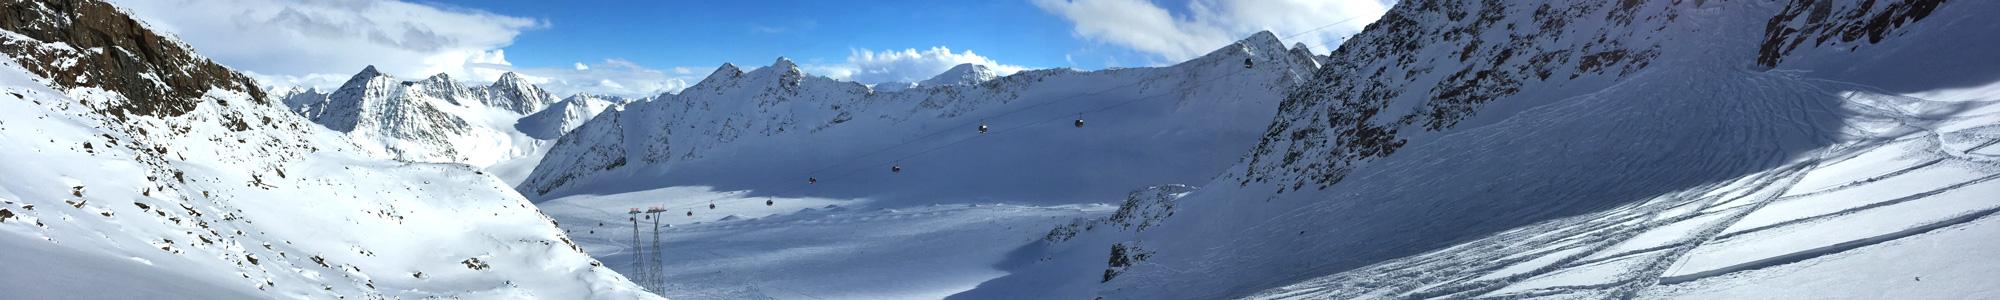 slide-ski-05